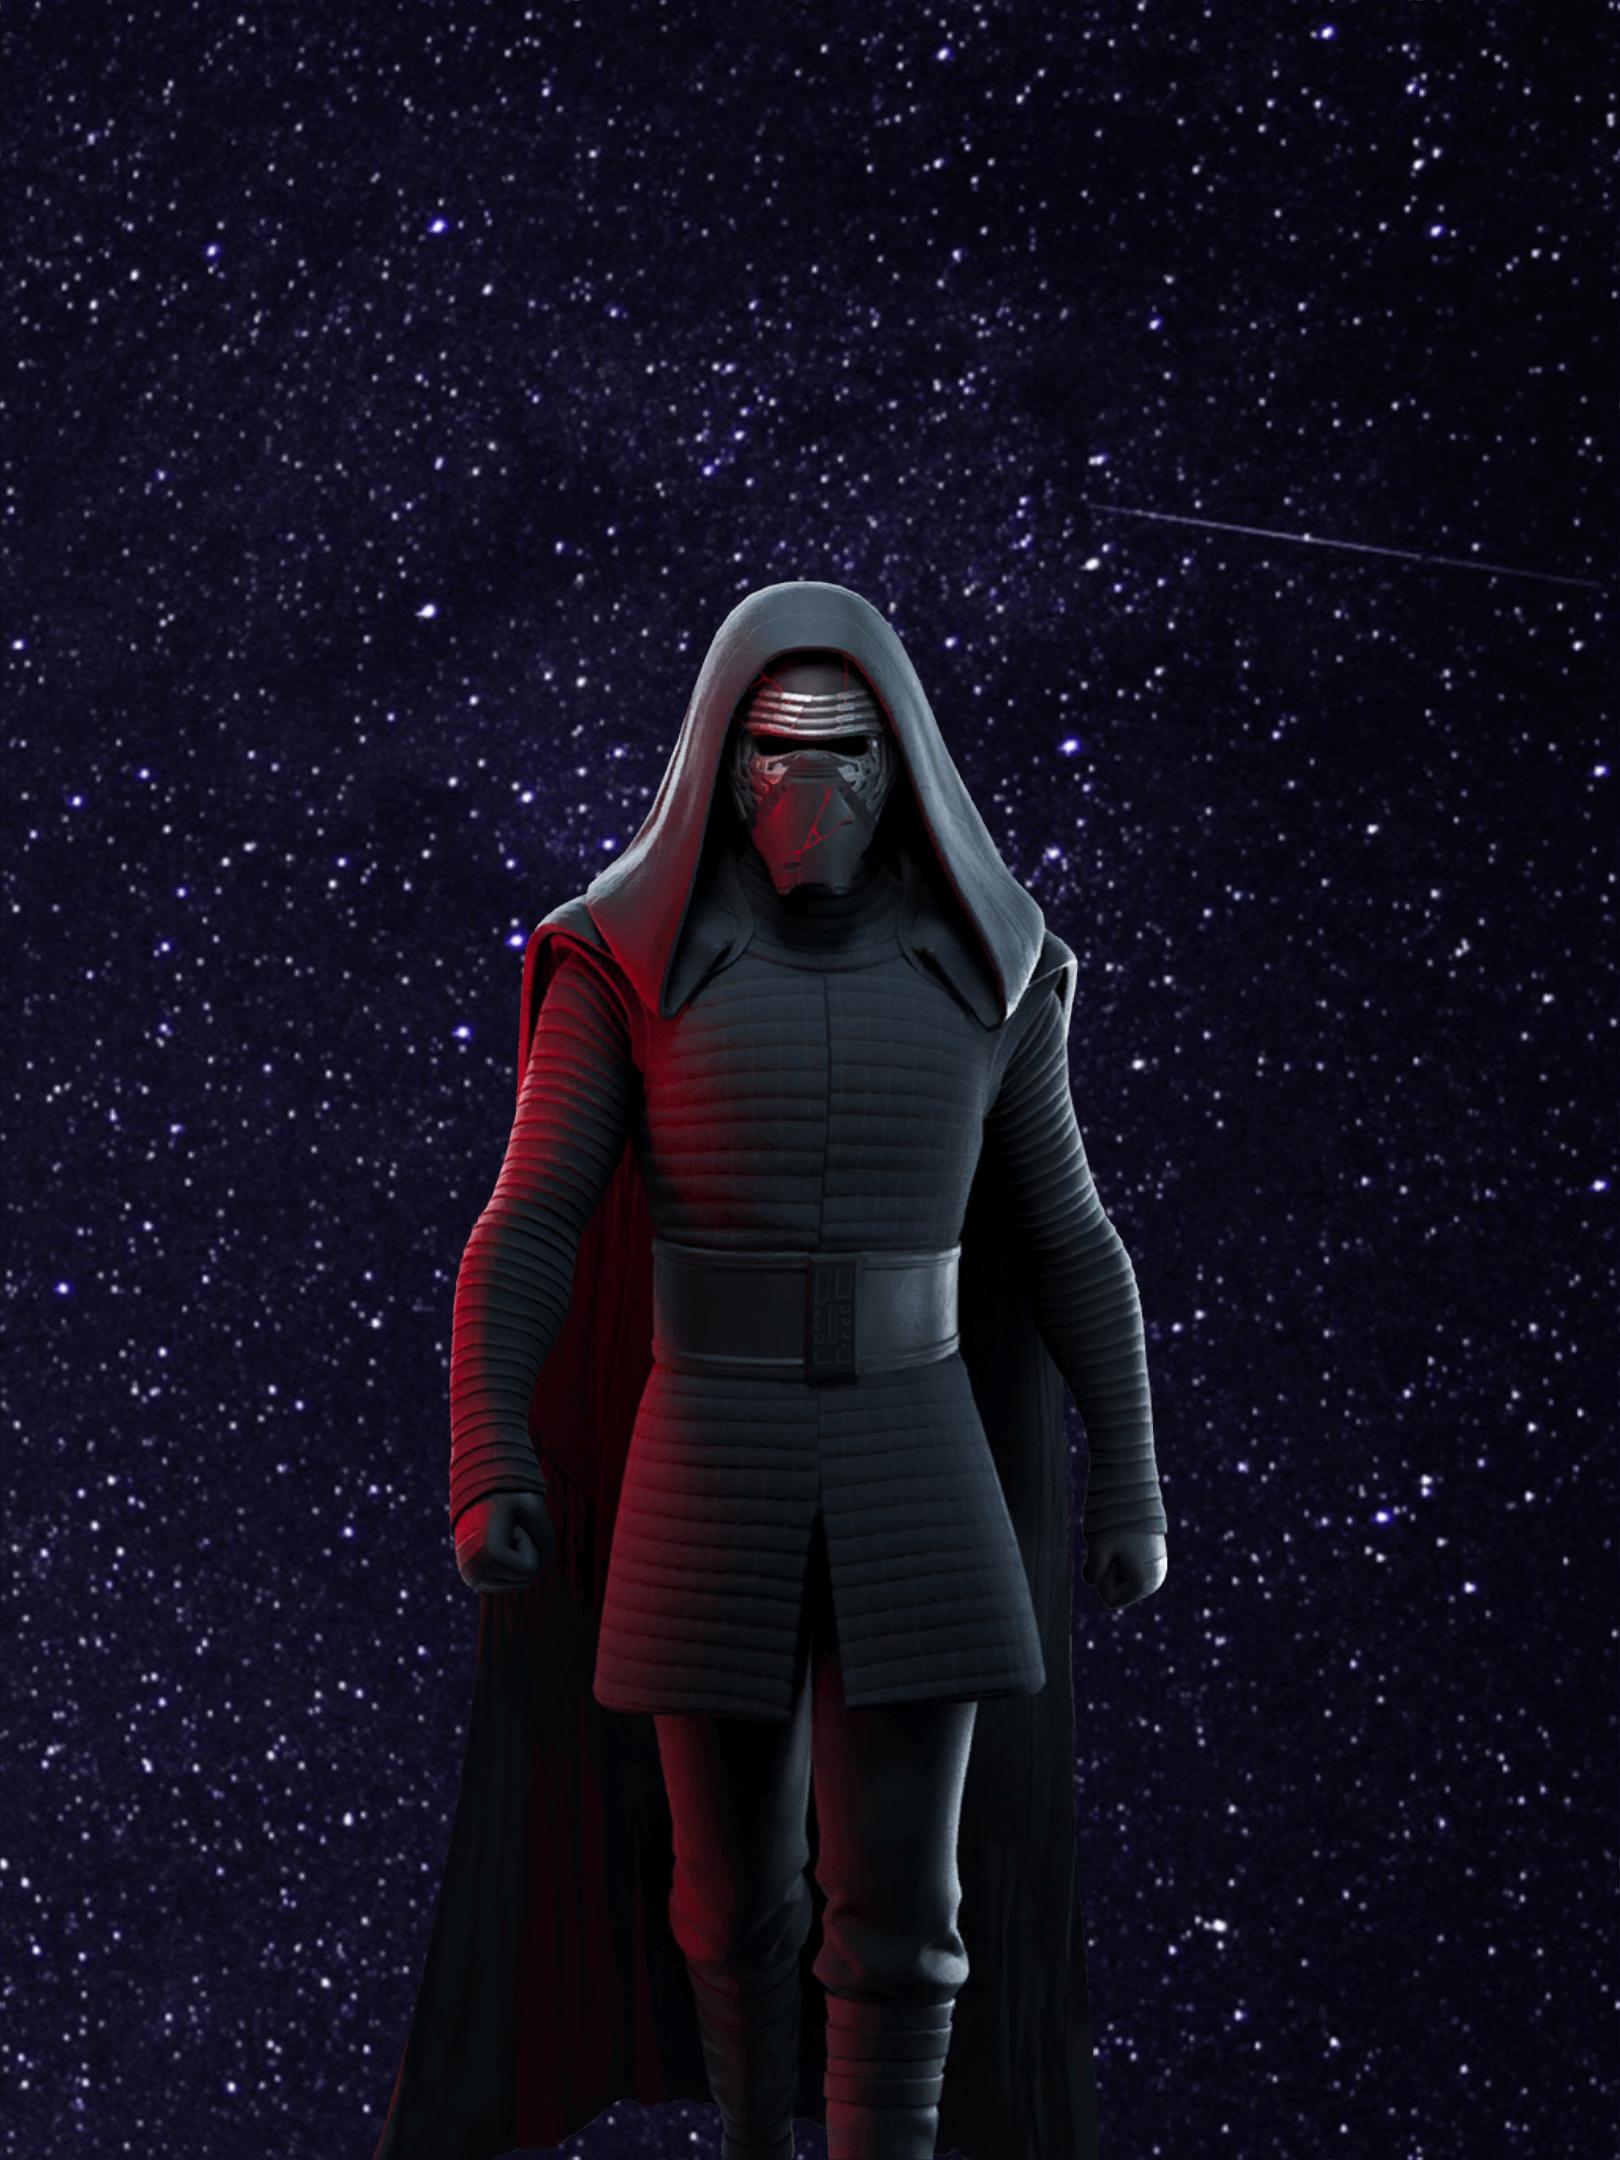 Kylo Ren Kylo Ren Fortnite Darth Vader